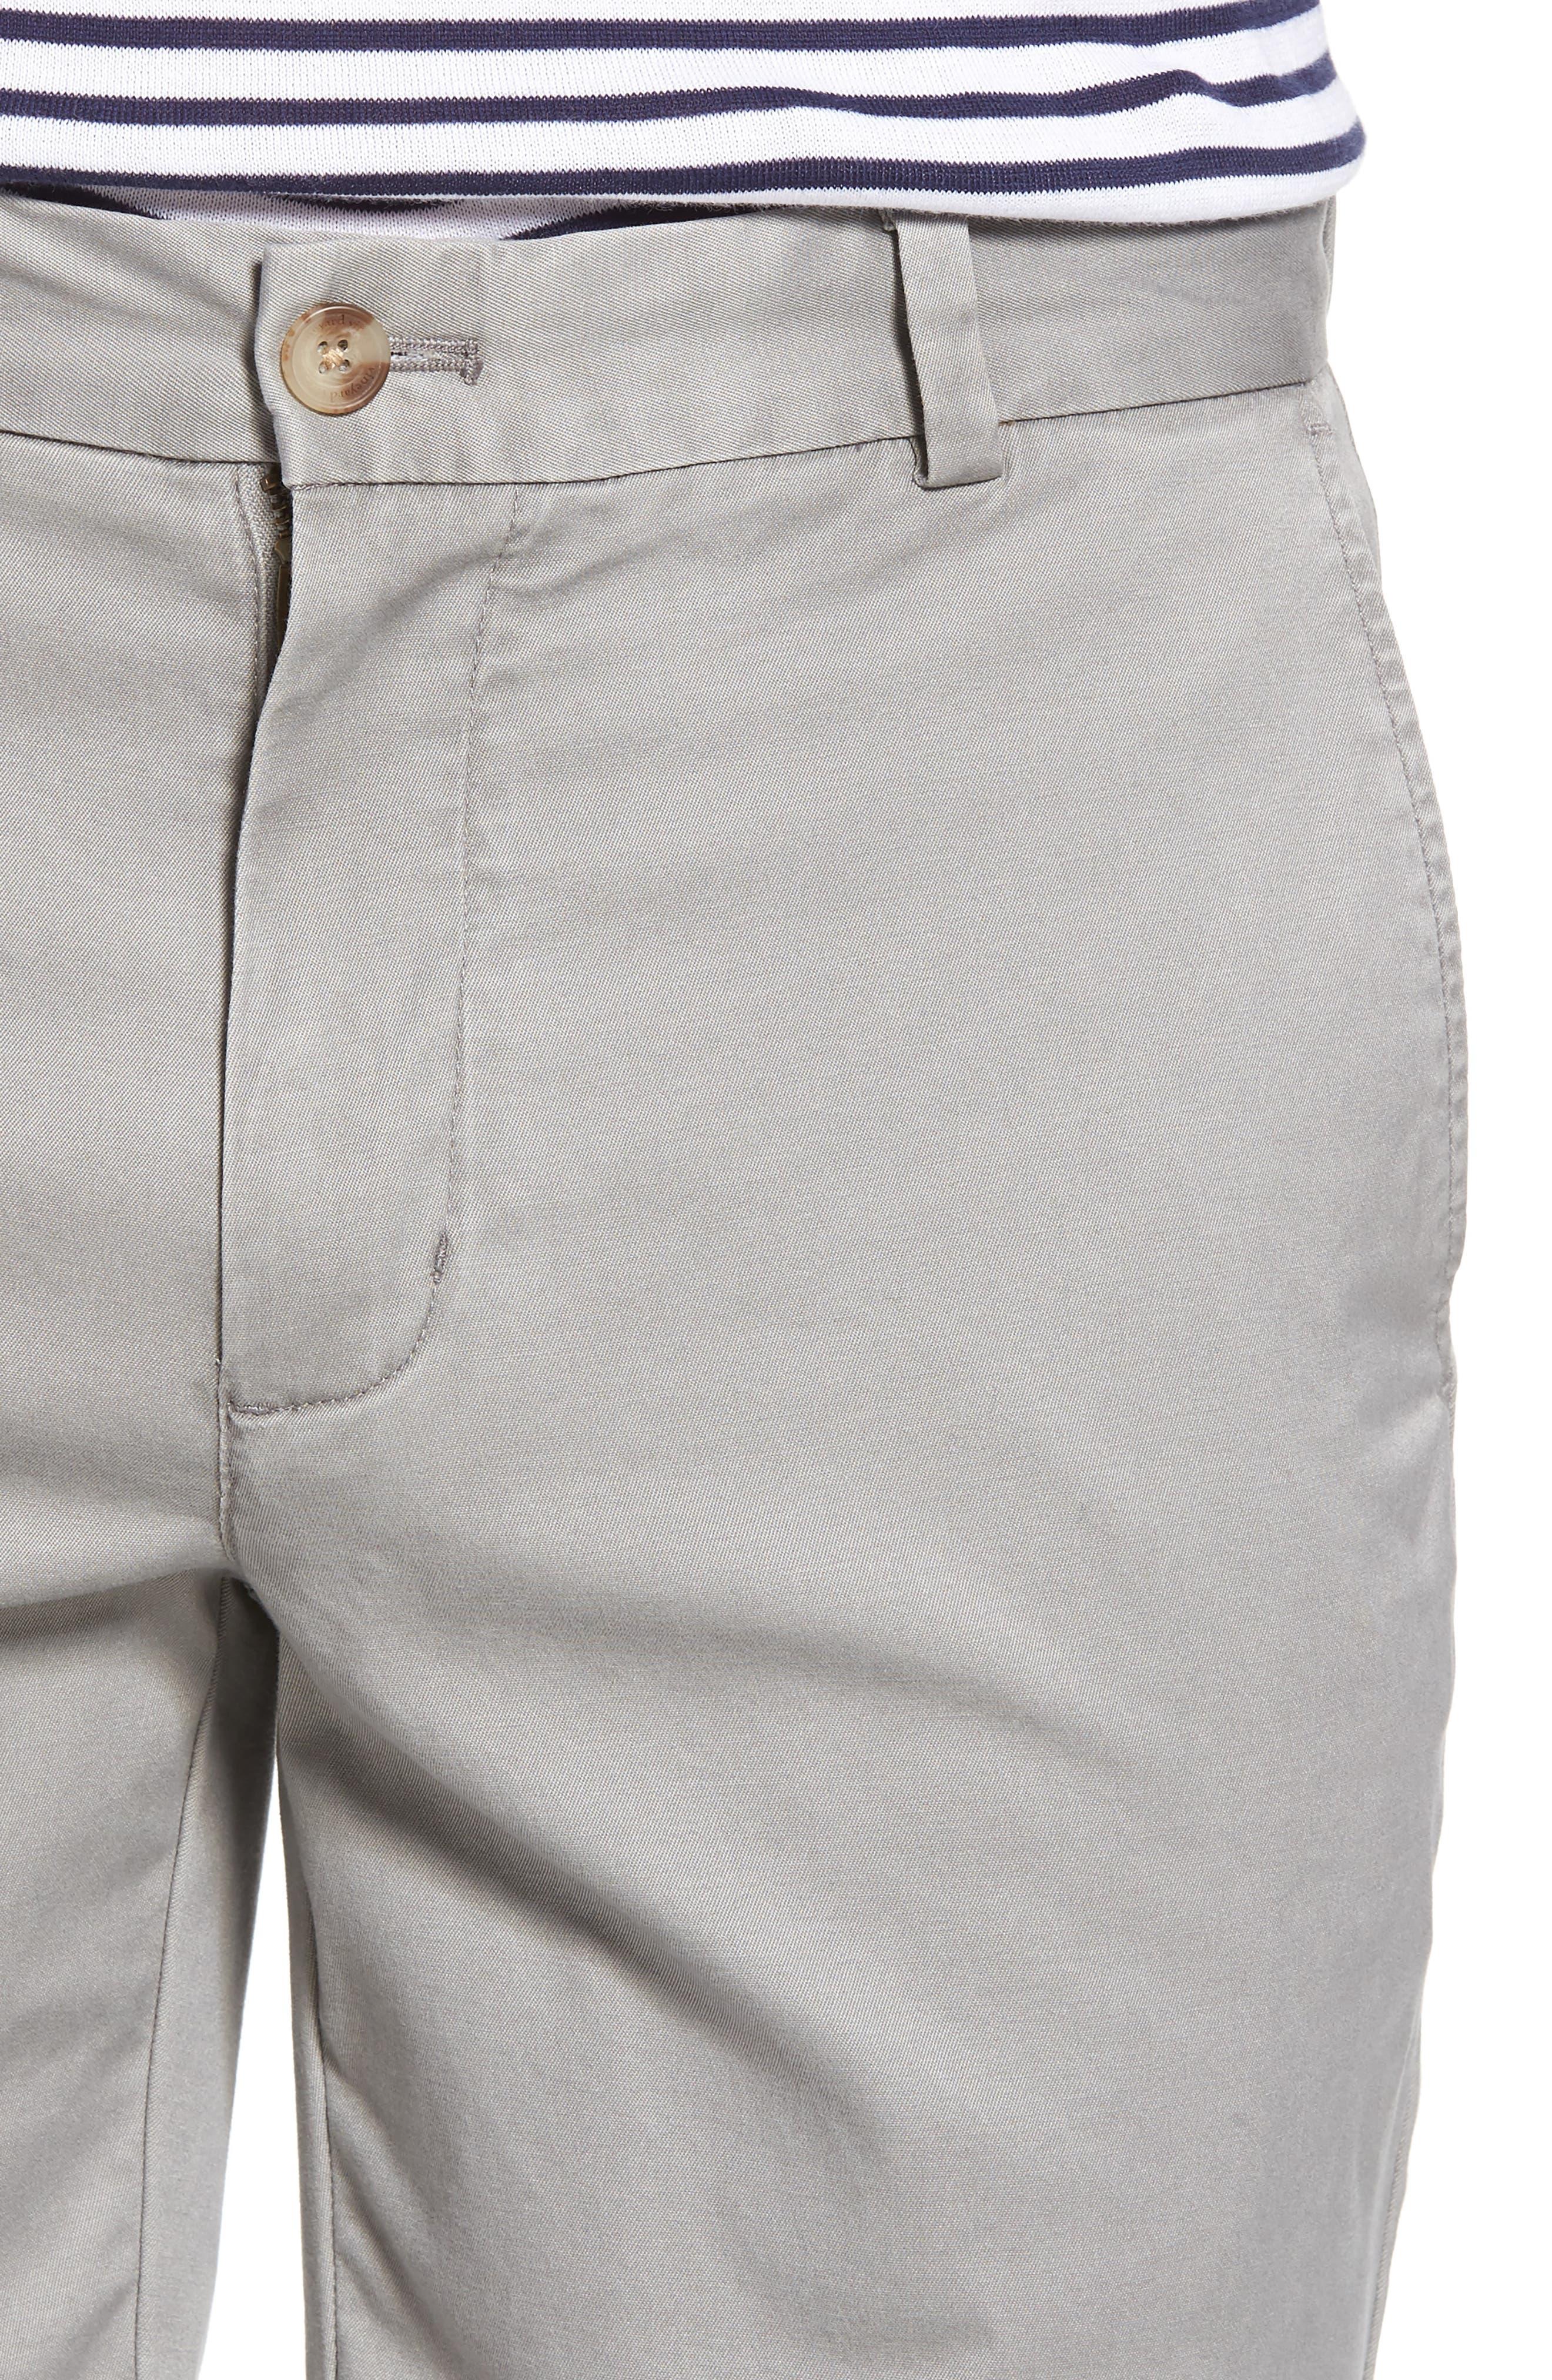 9 Inch Stretch Breaker Shorts,                             Alternate thumbnail 68, color,